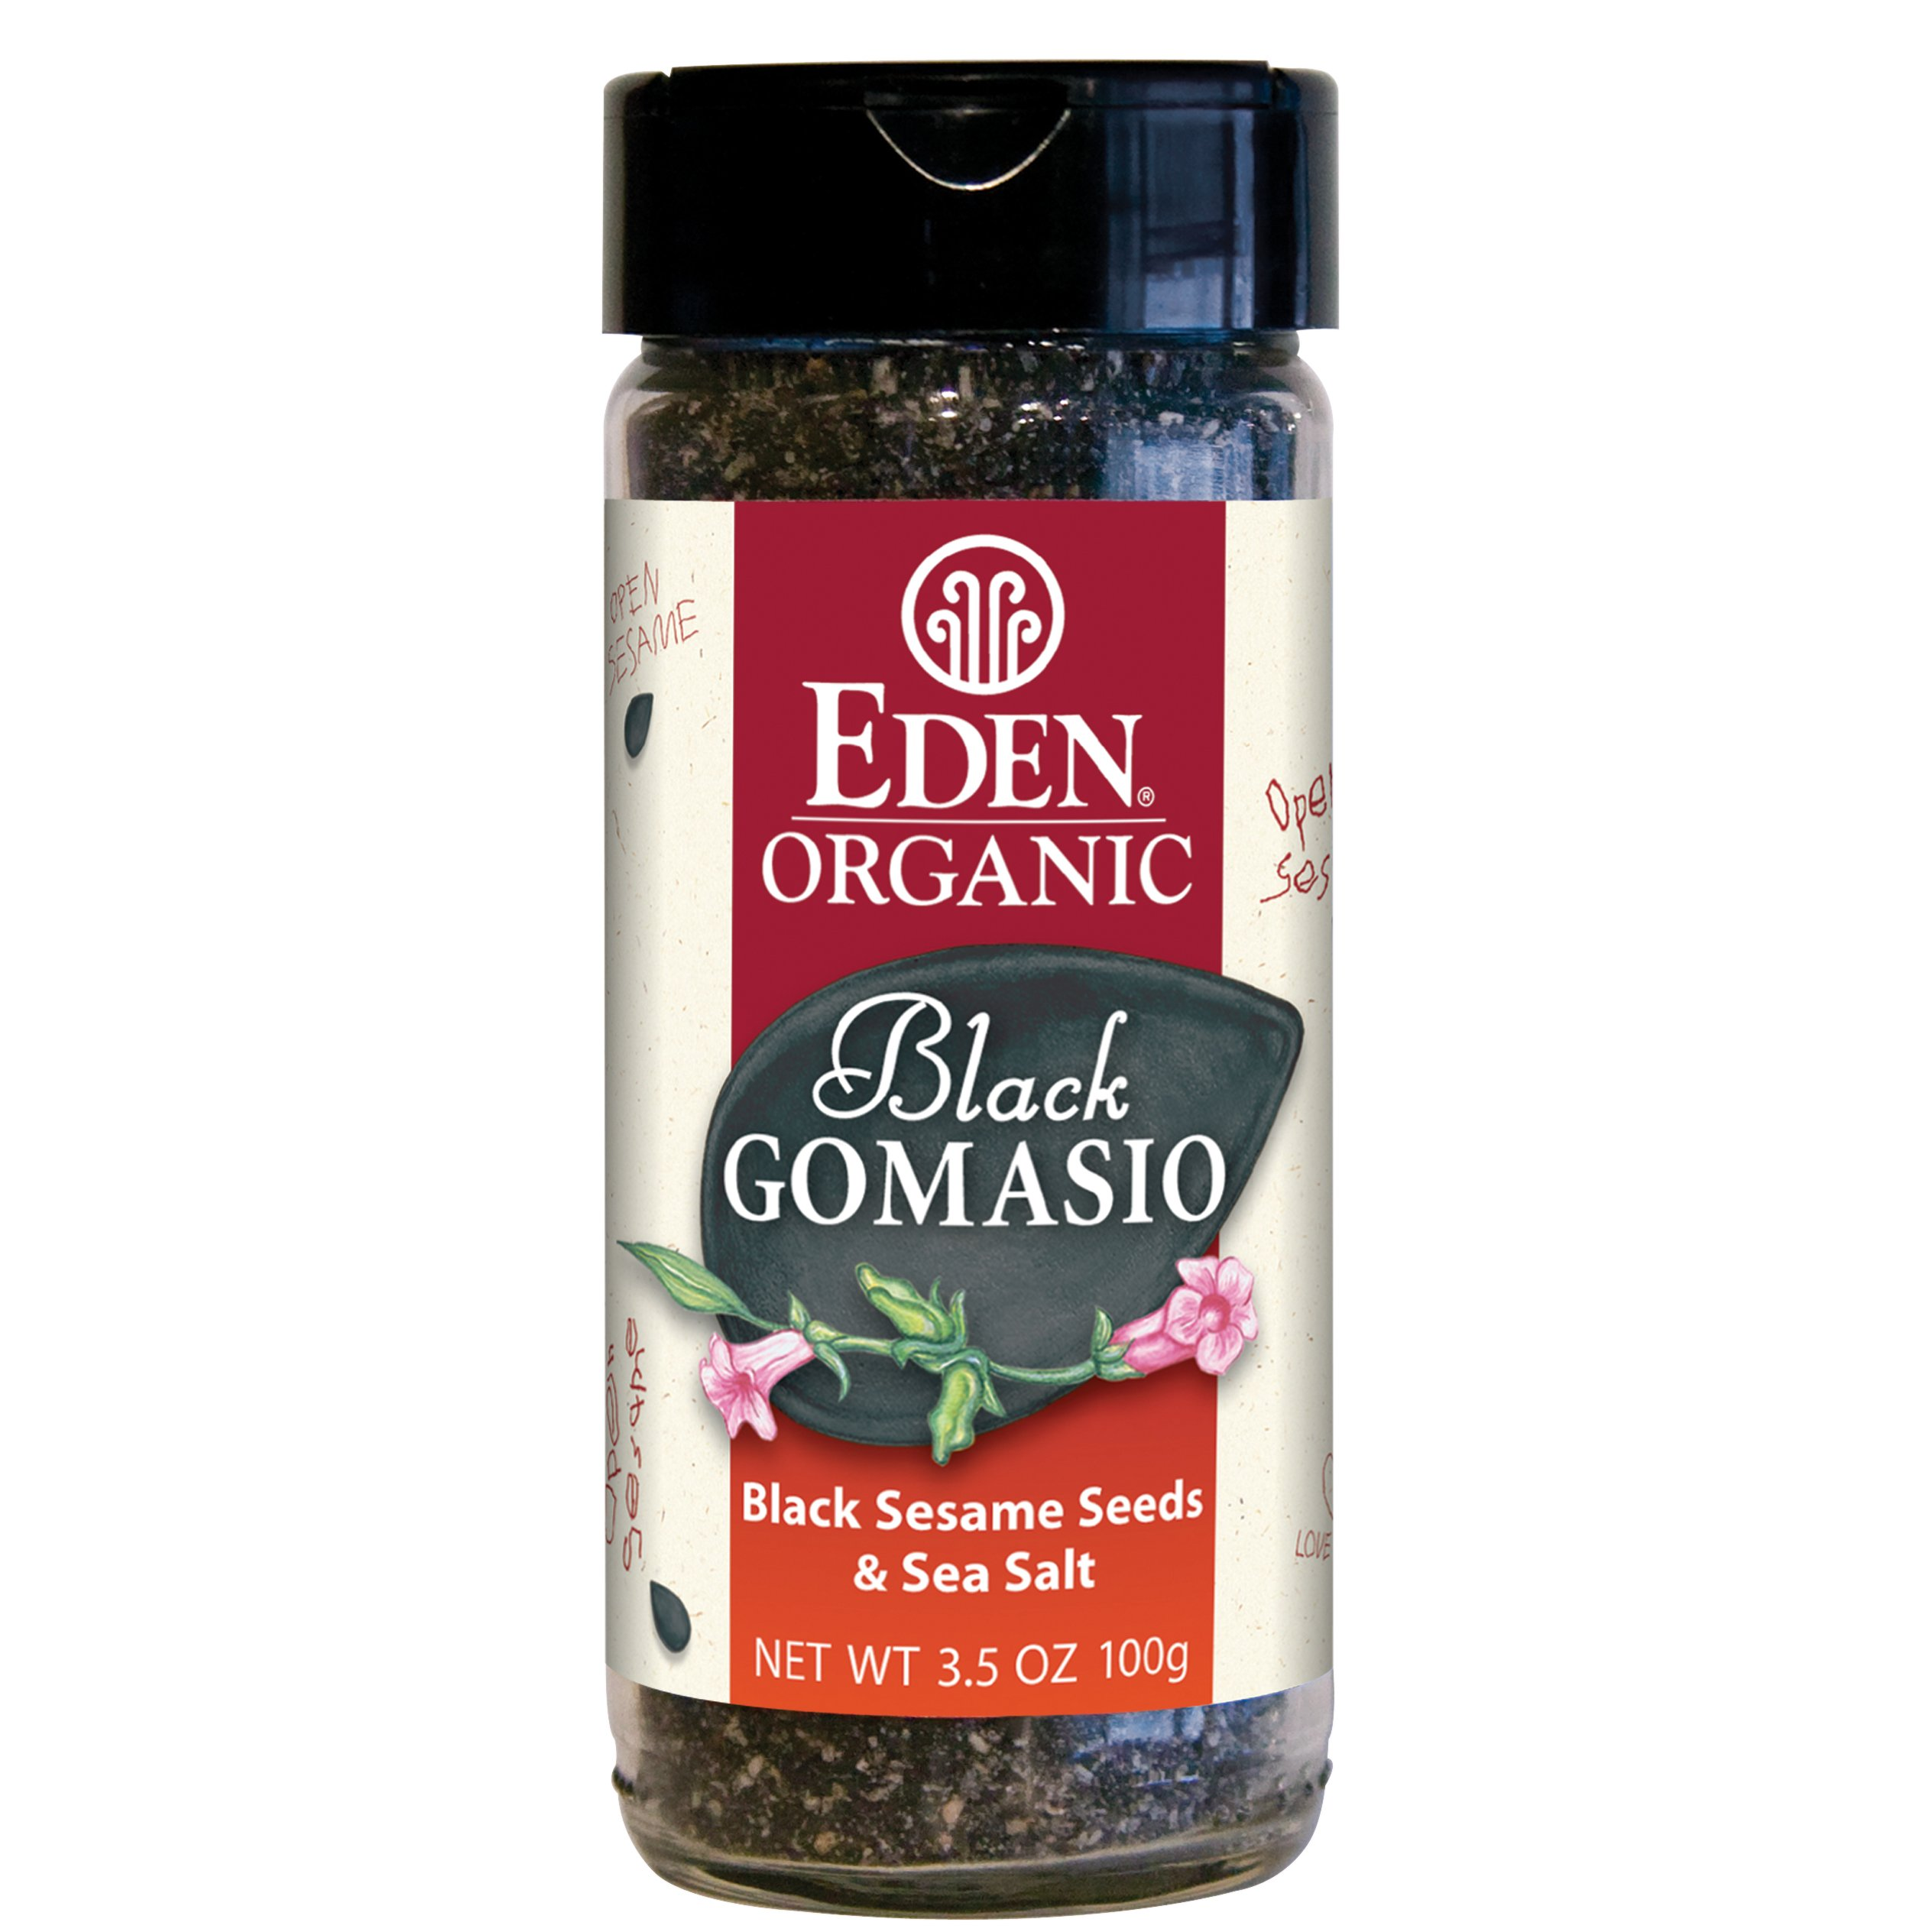 Eden Organic Black Gomasio, 3.5-Ounce Jars (Pack of 12)